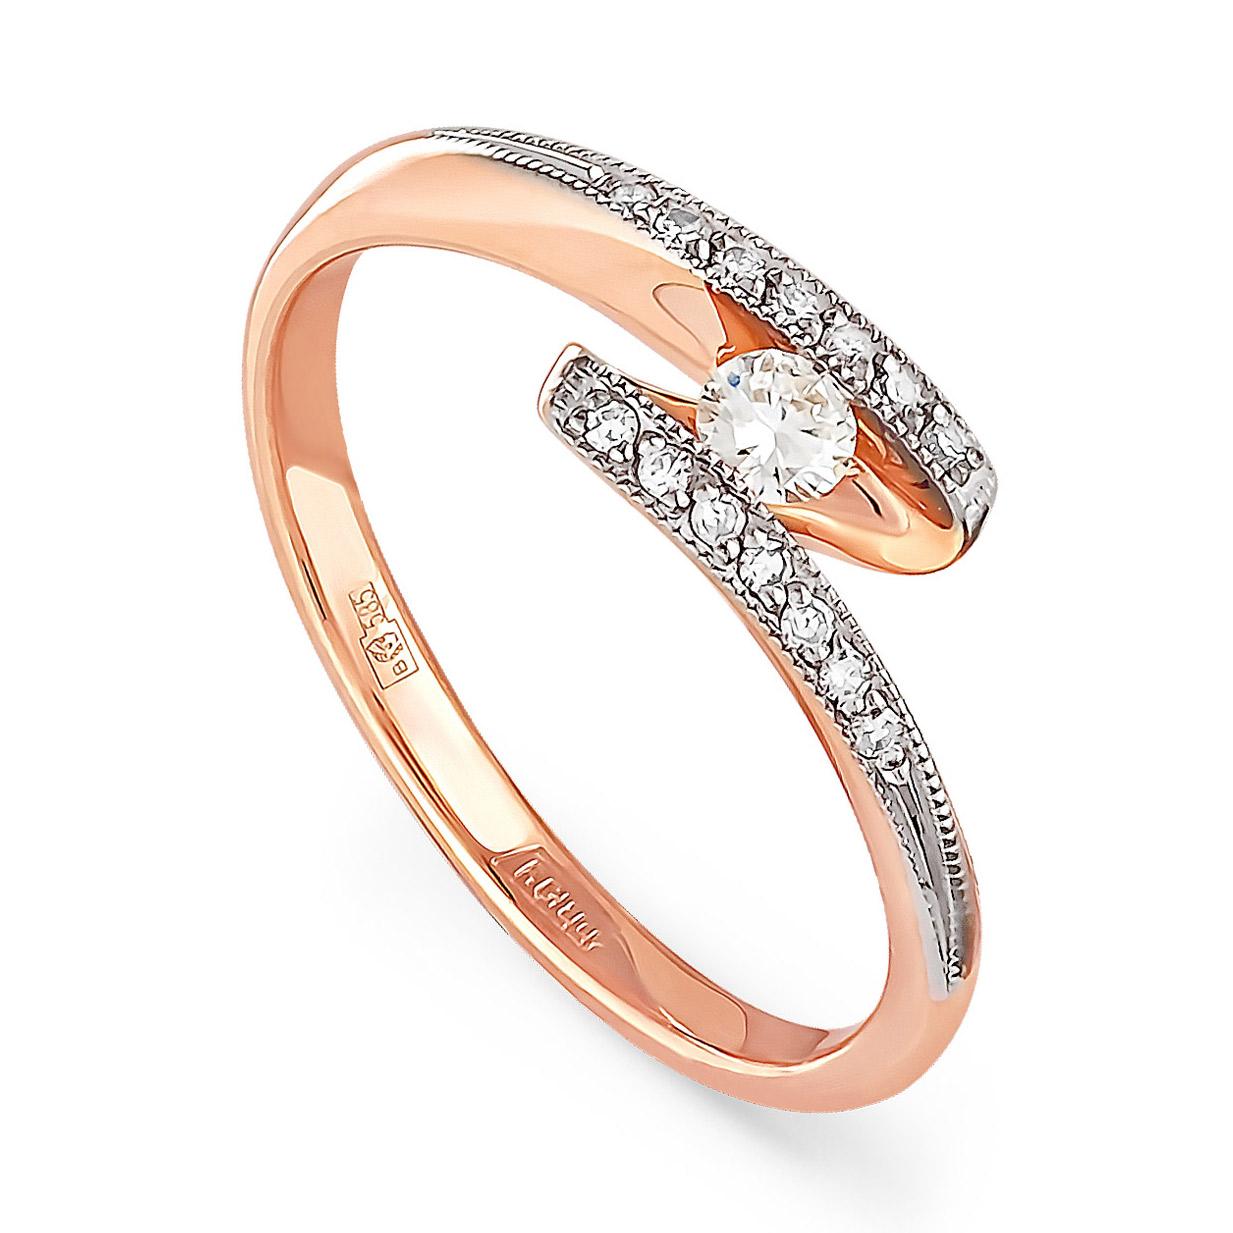 Золотое кольцо Бриллиант арт. 11-0240 11-0240